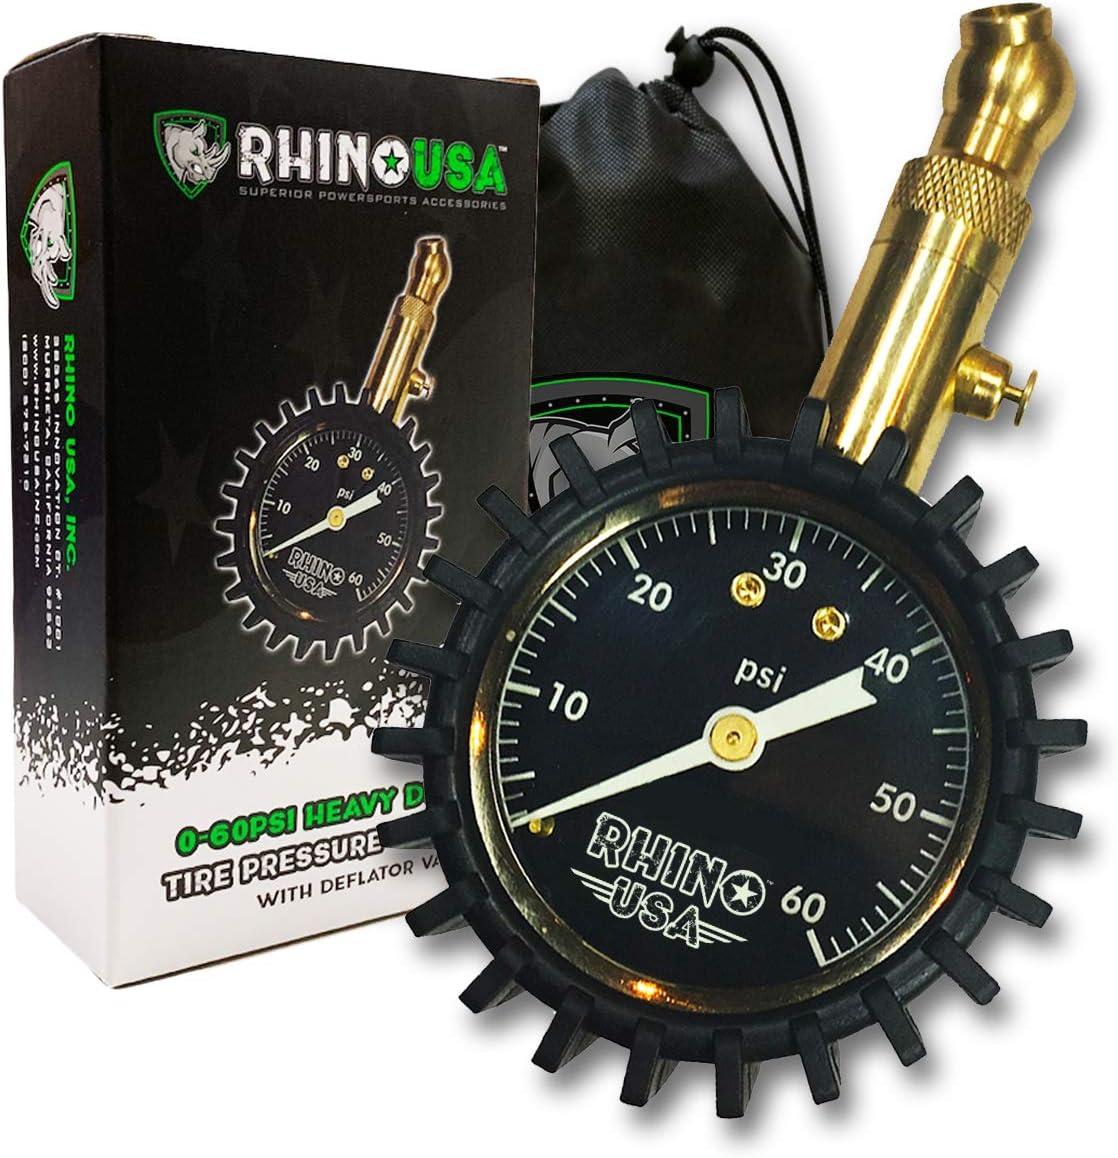 Rhino USA Heavy-Duty Tire Pressure Gauge